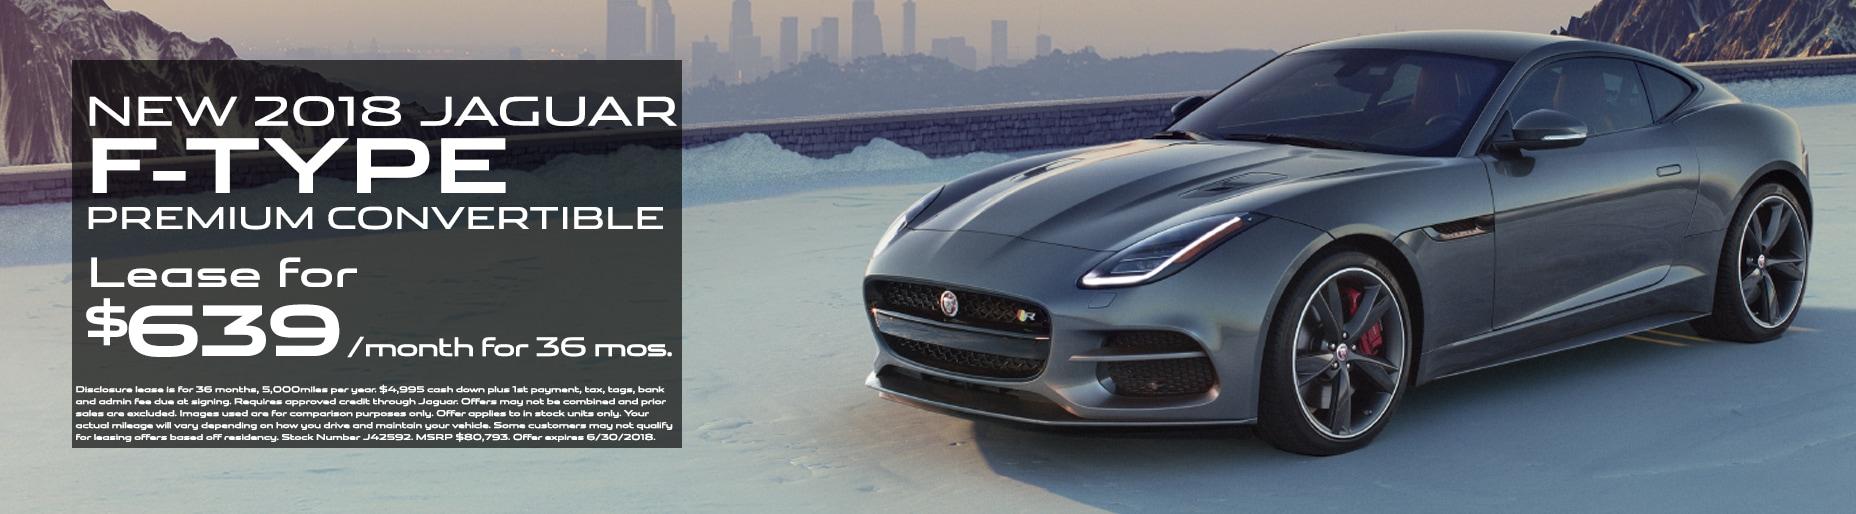 me new sport fresh near of chosencars allentown dealership best in car xj jaguar r